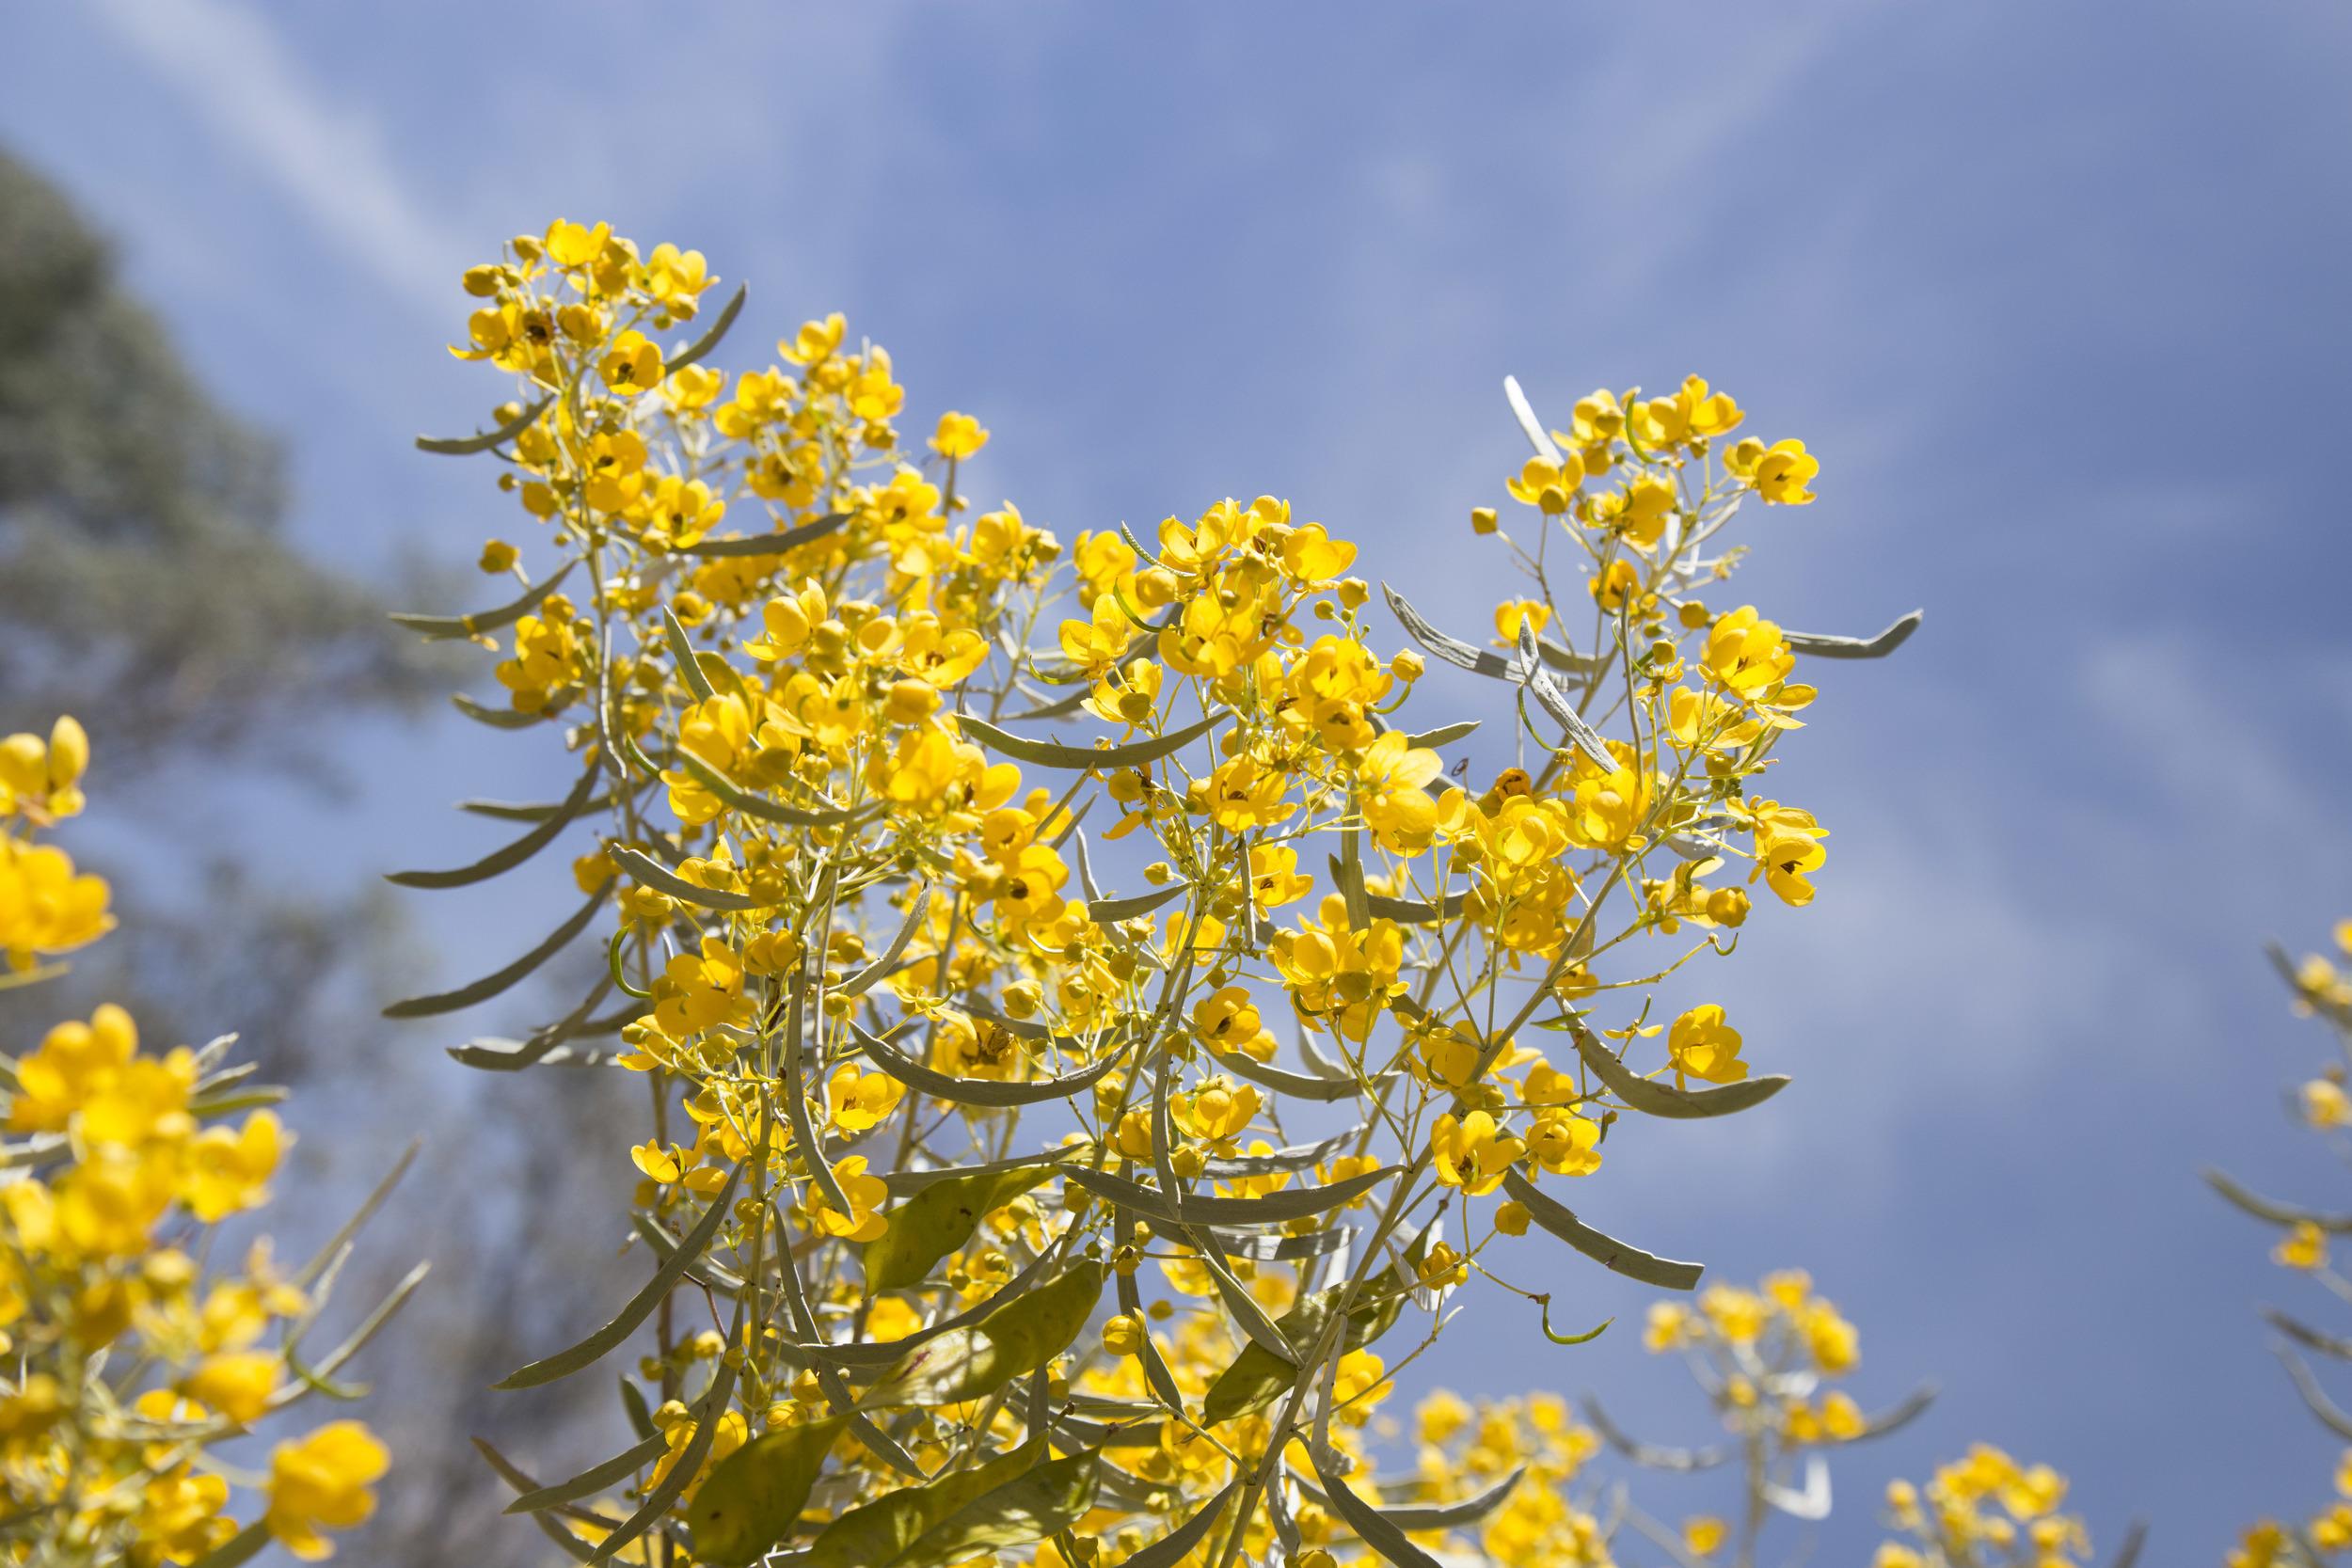 so many amazing floral frangrances